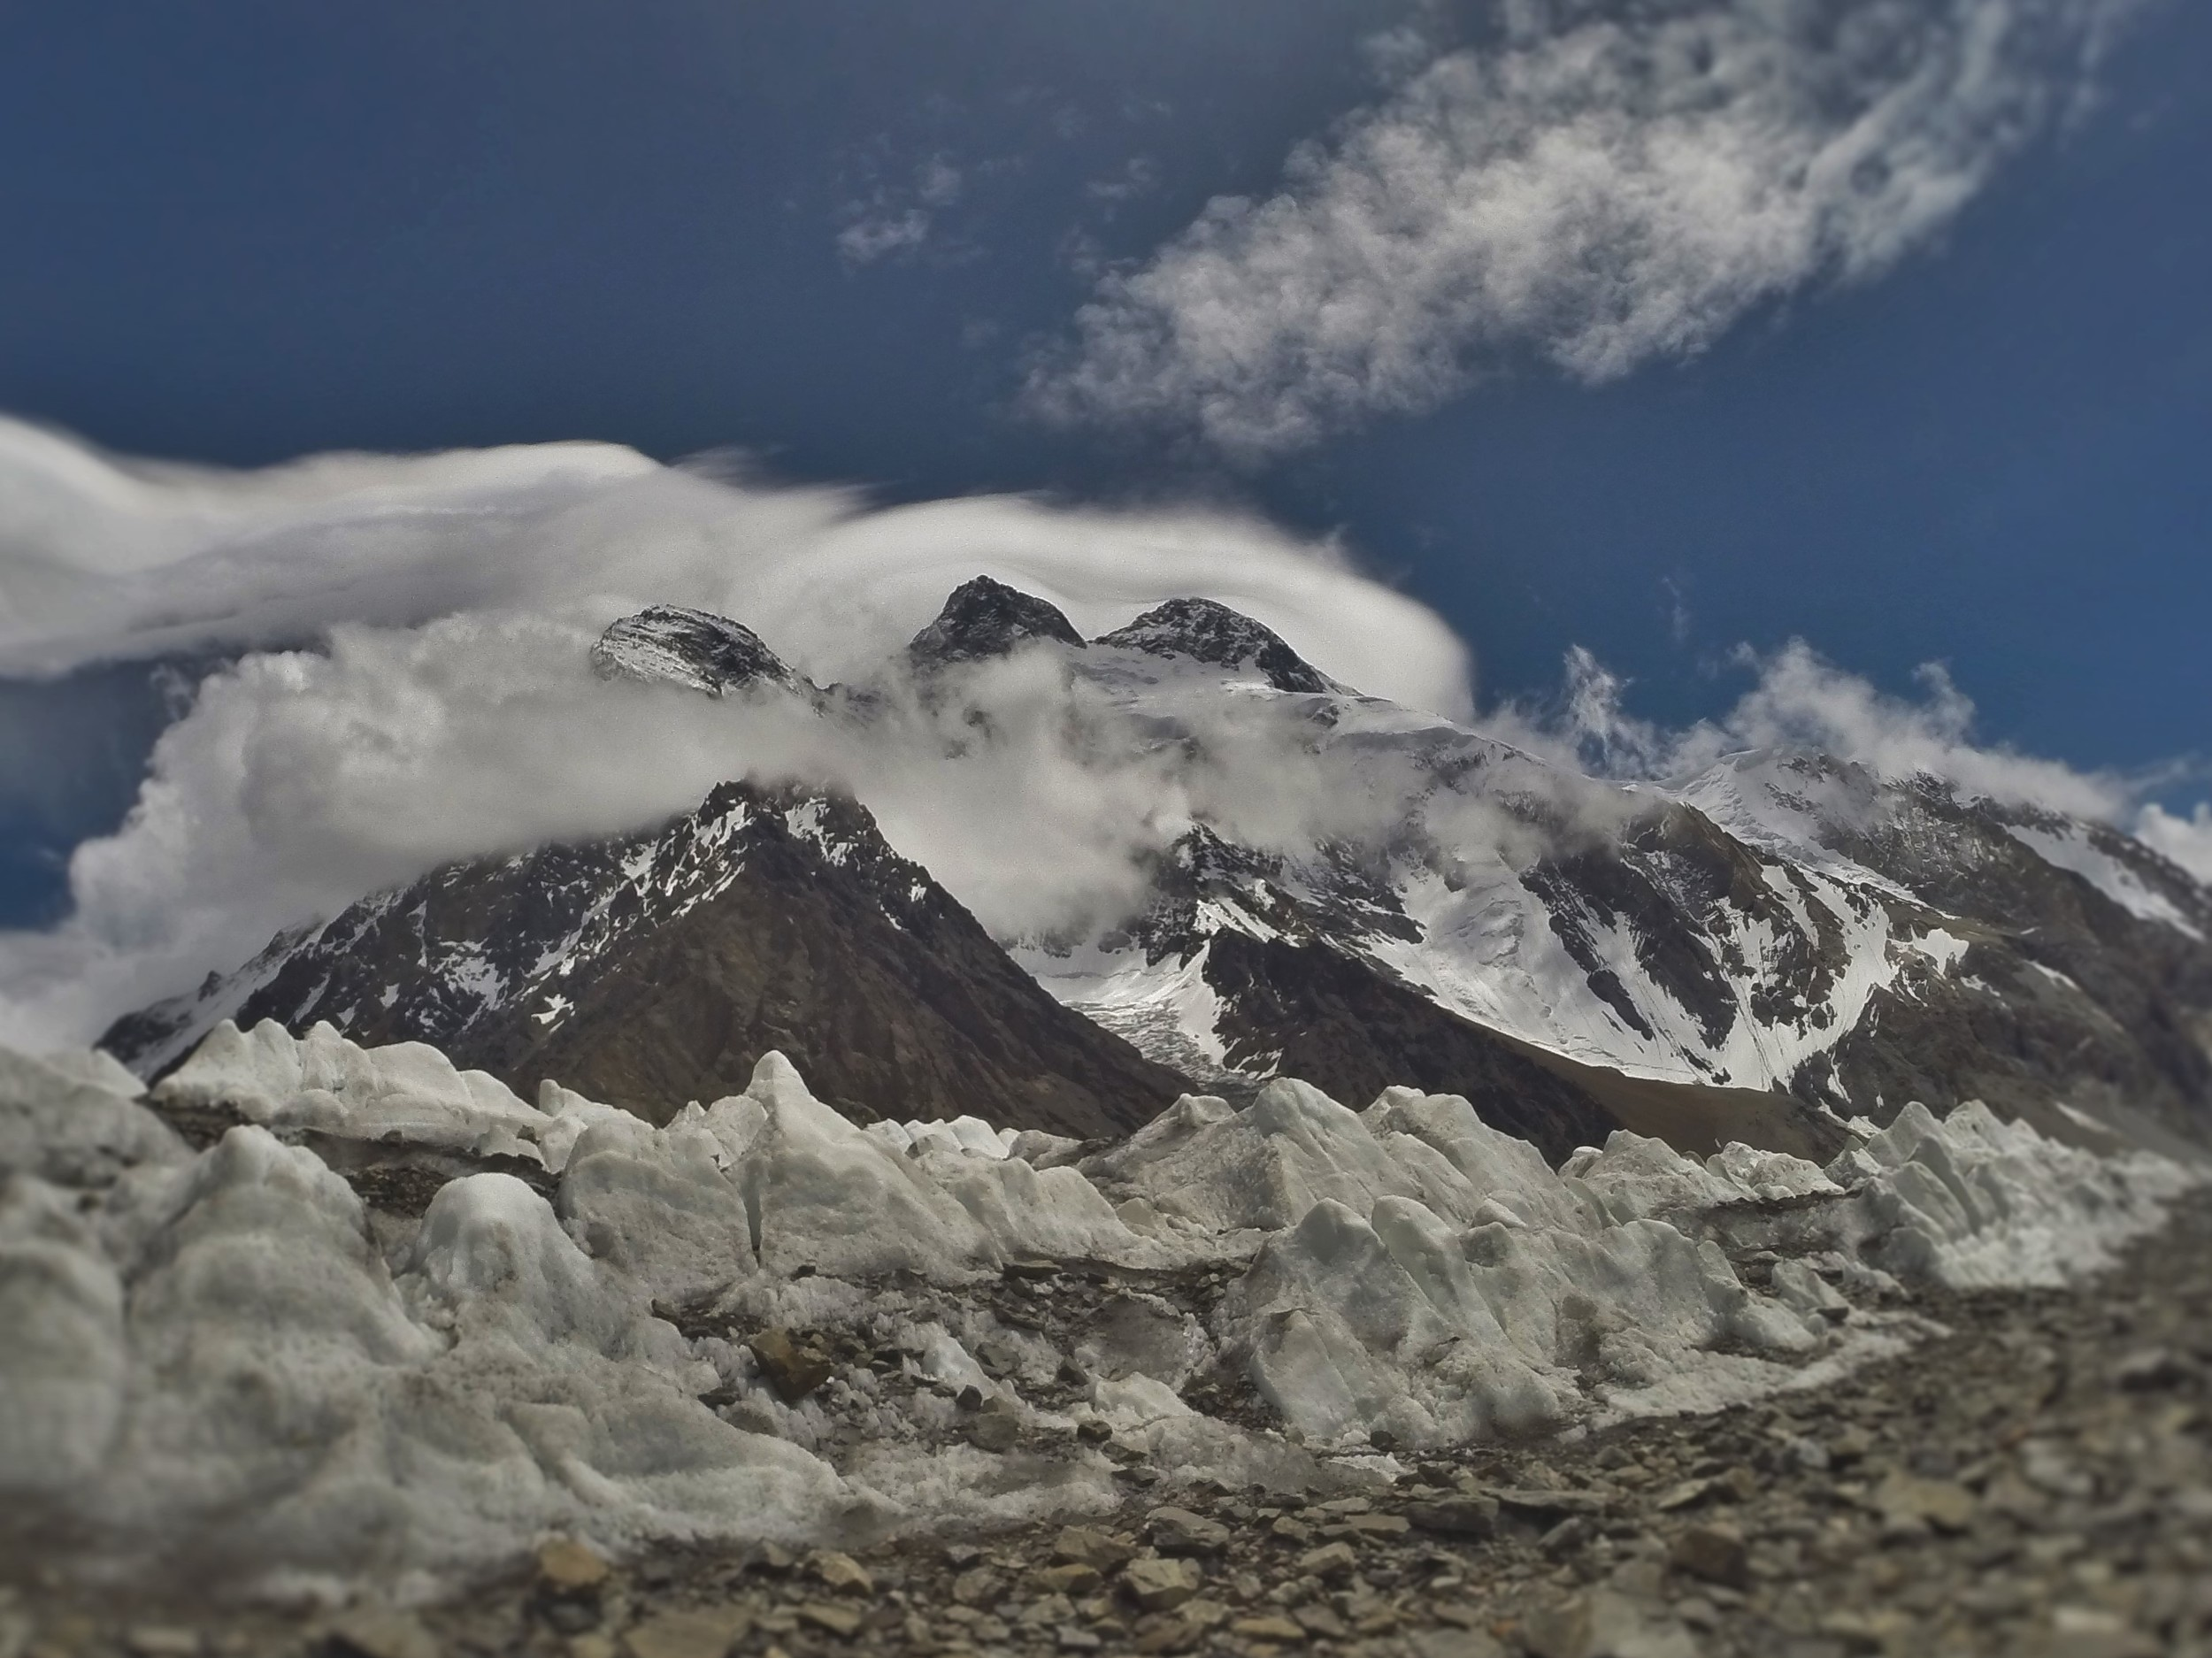 triple summits of Broad peak from the Goodwin Austin Glacier